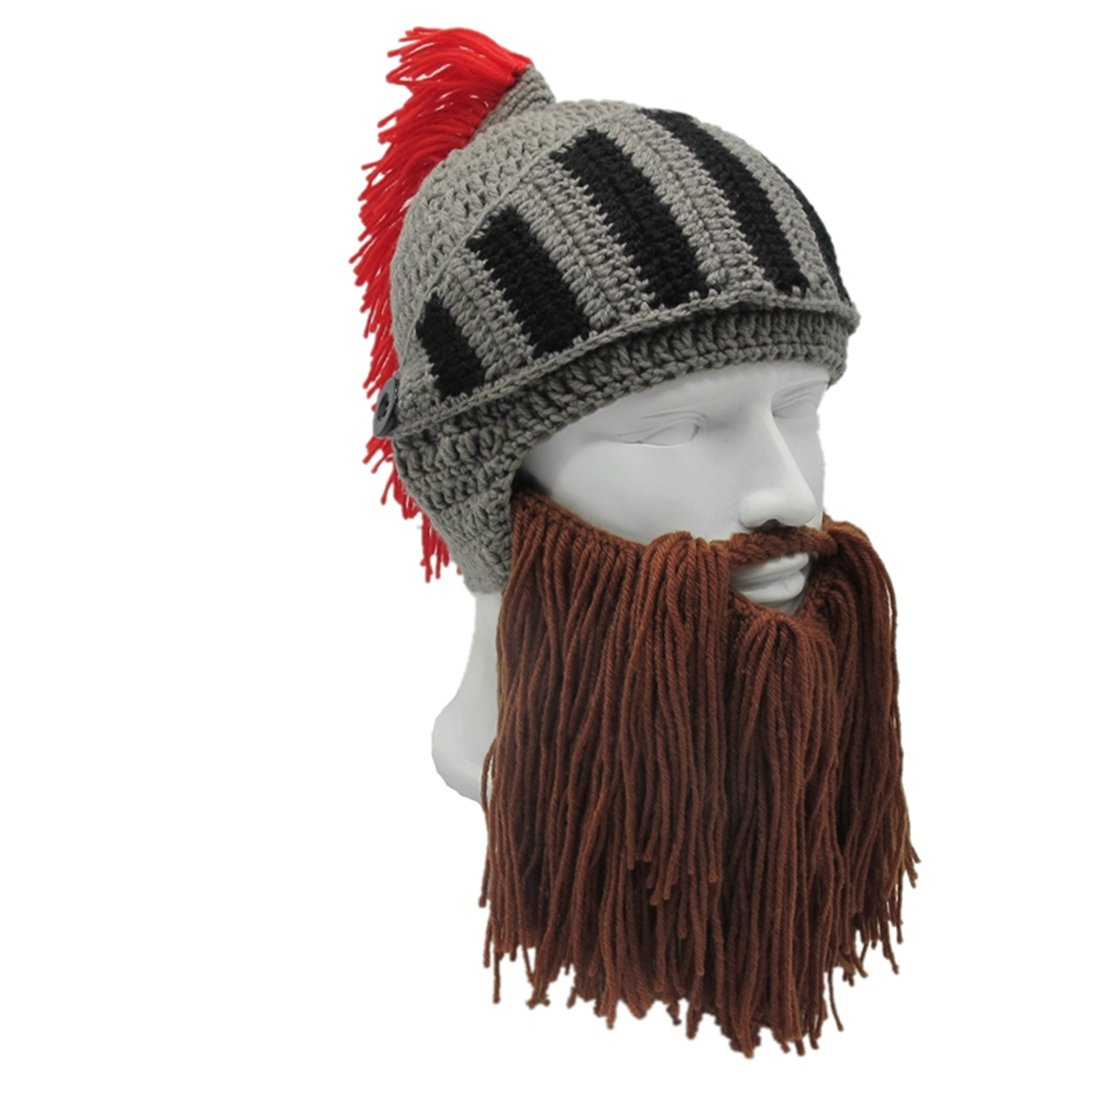 43e28671c64 ZGZY Beard Hat Beanie Hat Knit Hat The Original Barbarian Warrior Knit  Beard Hat Halloween Viking Horns Bearded Caps Windproof Funny for Men    Women ...